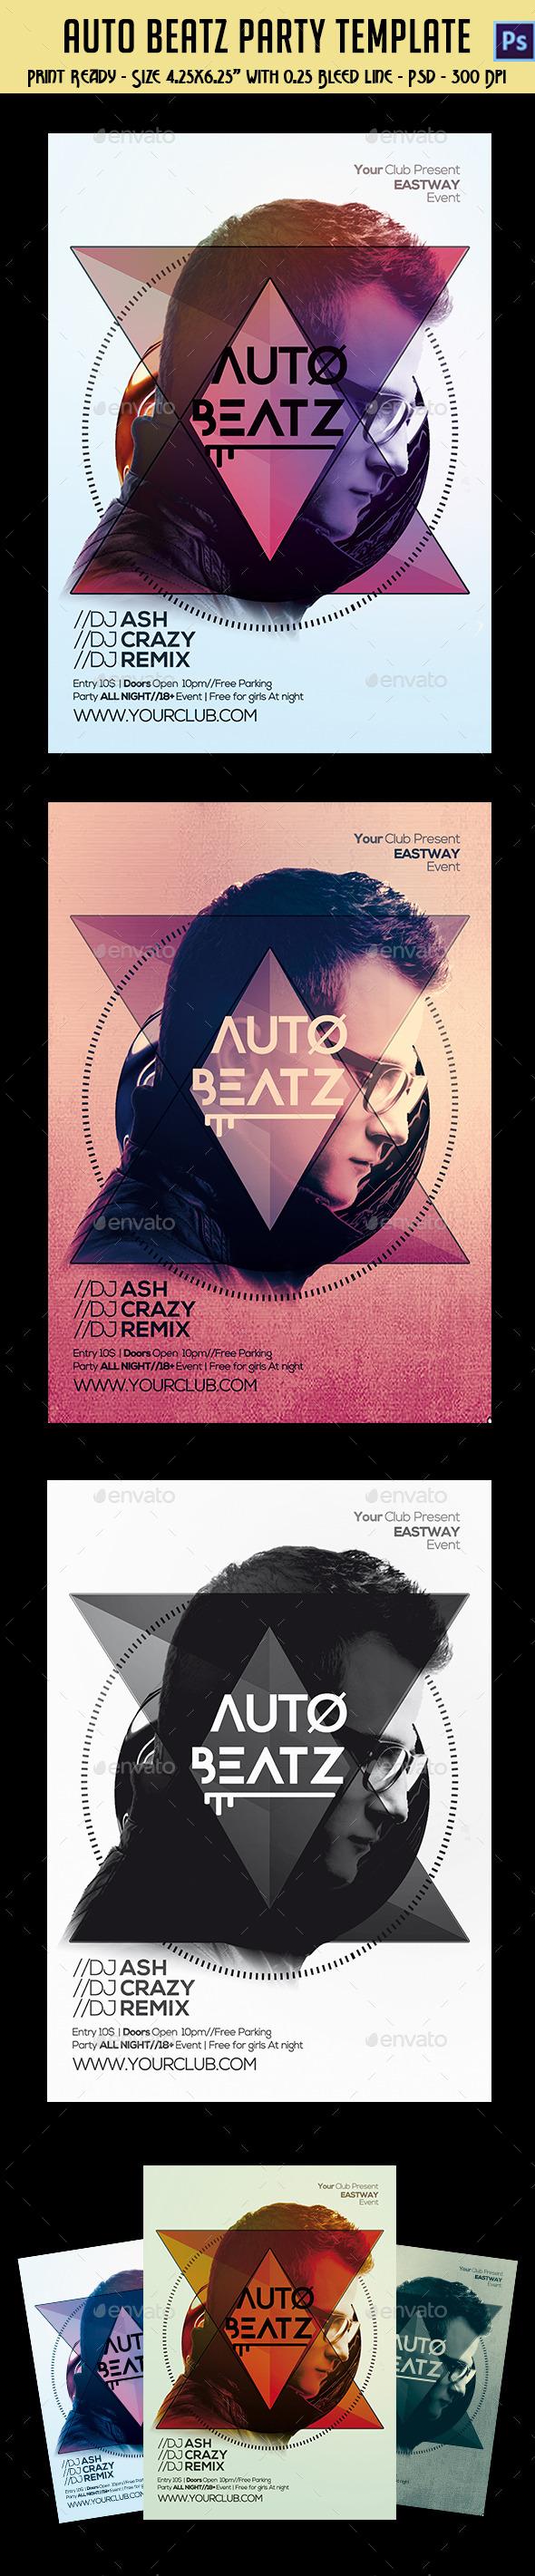 GraphicRiver Auto Beatz Party Template 10336934